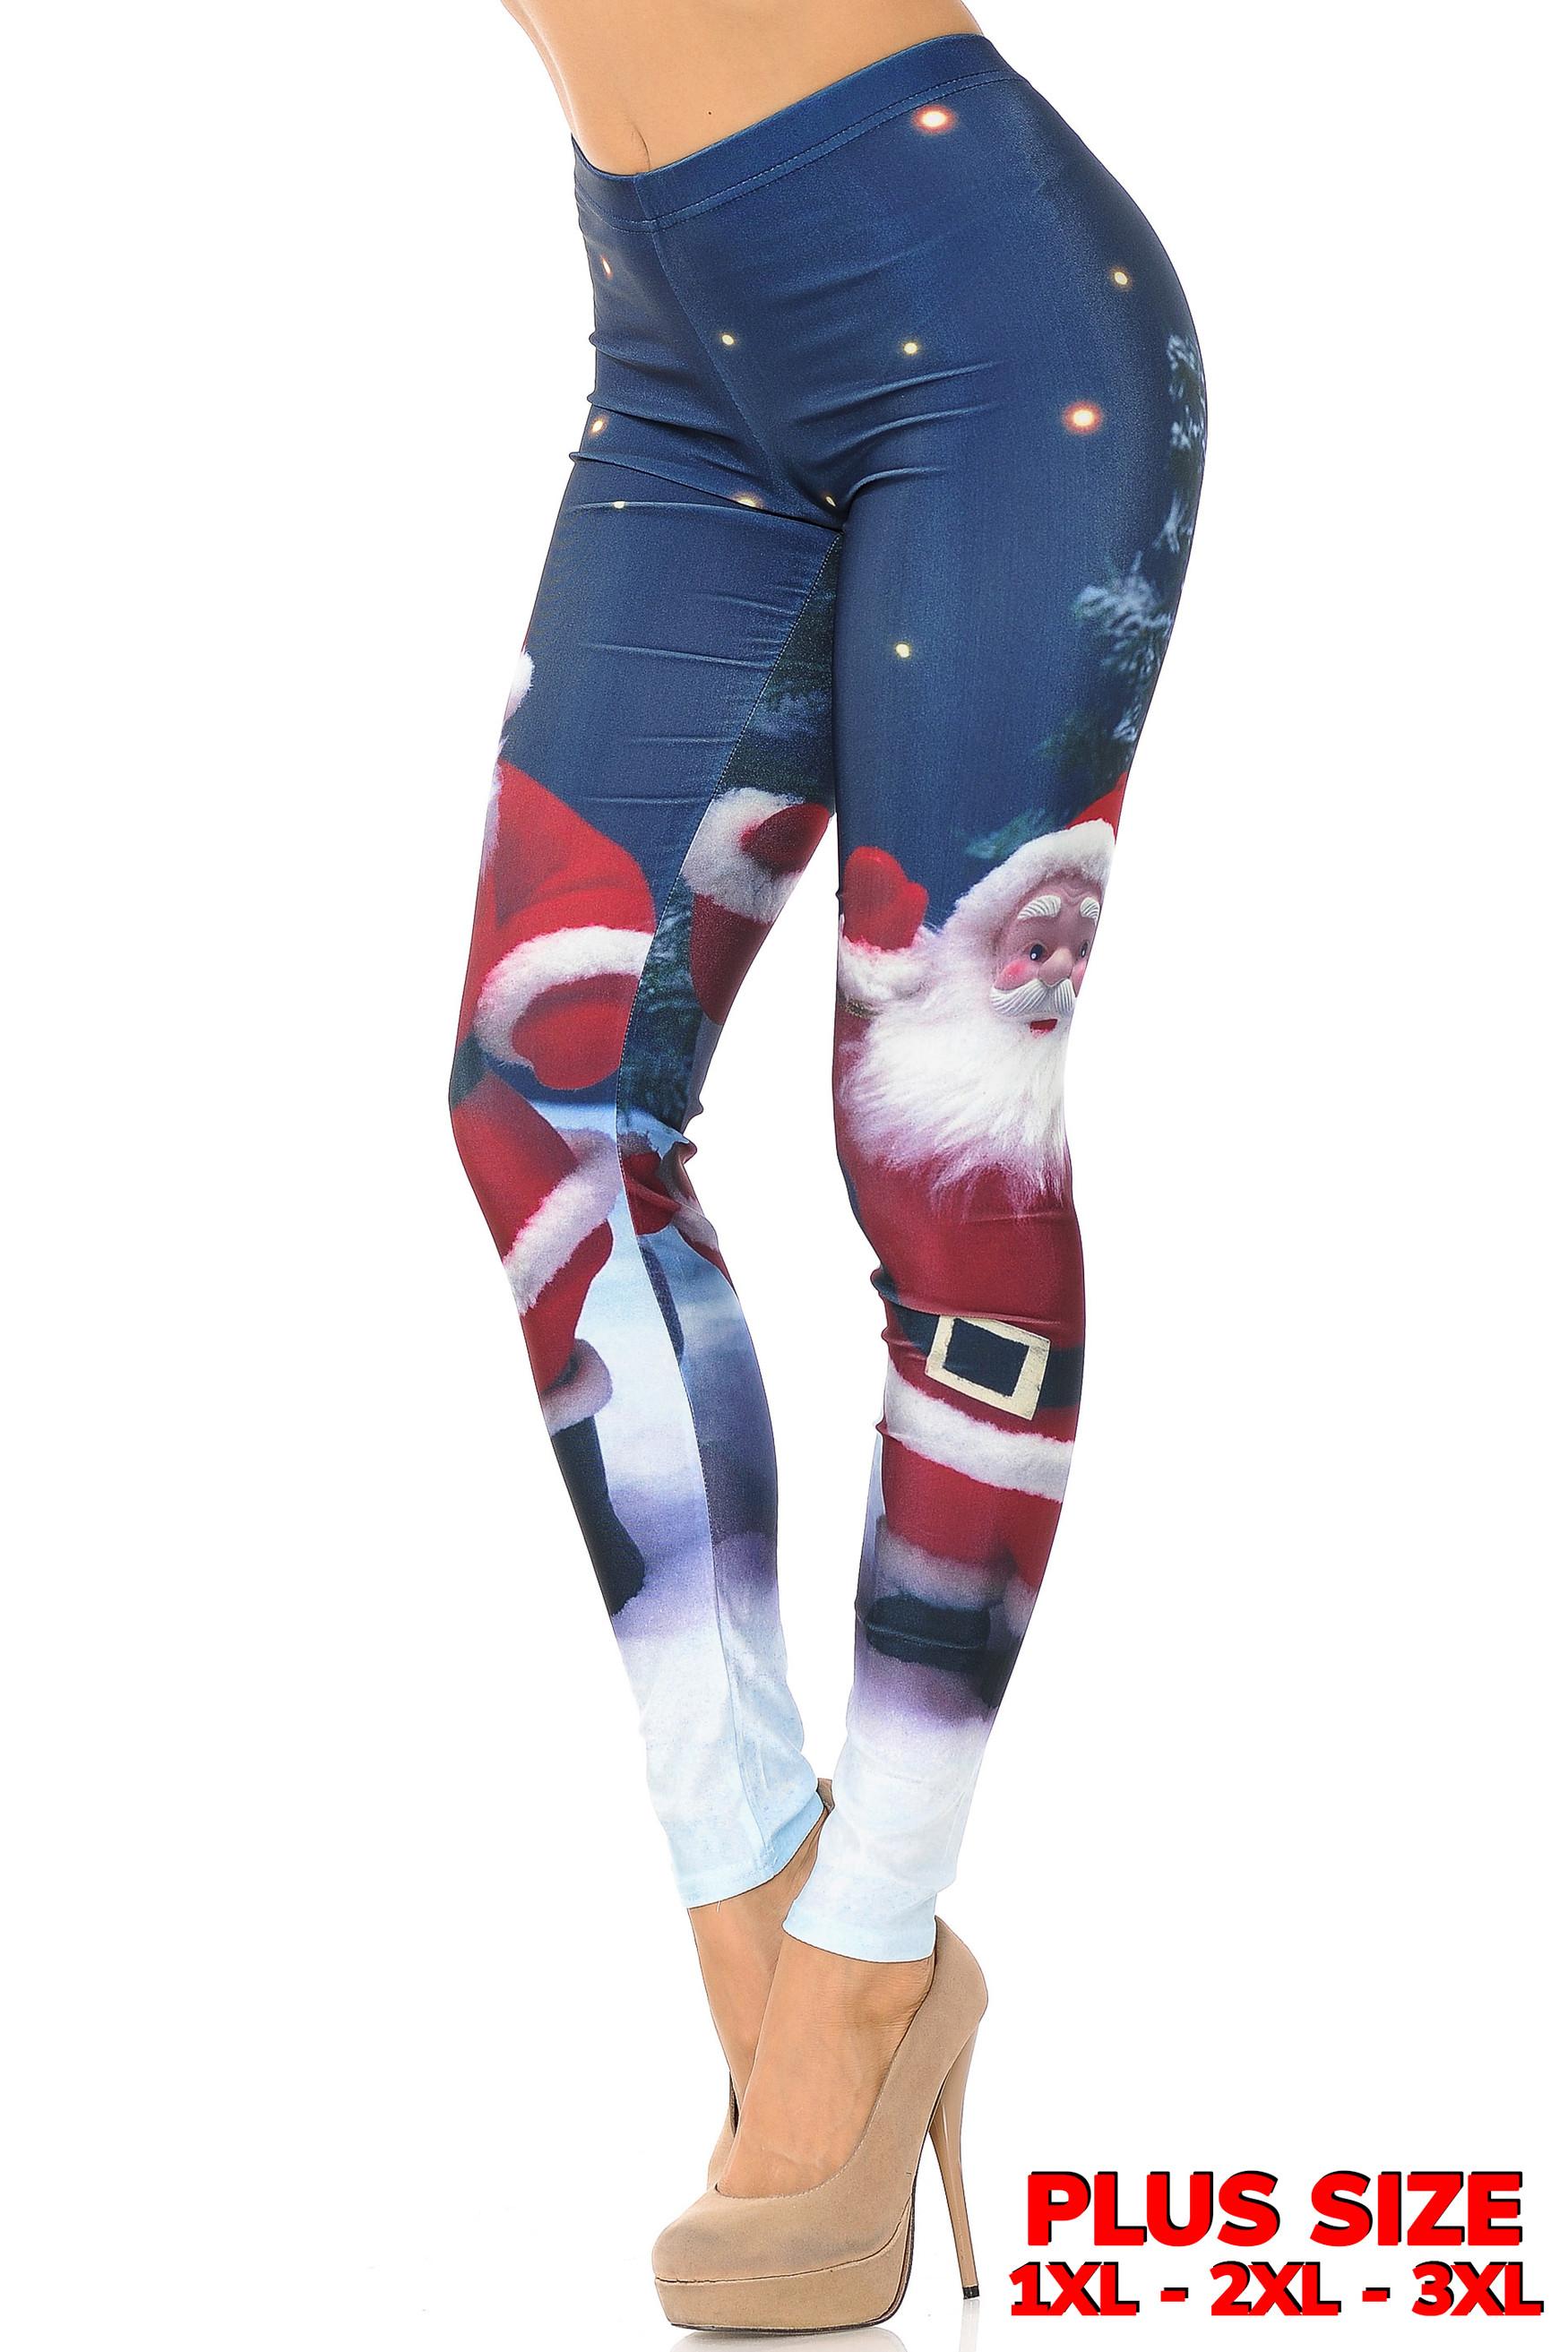 Jolly Santa Claus Leggings - Plus Size